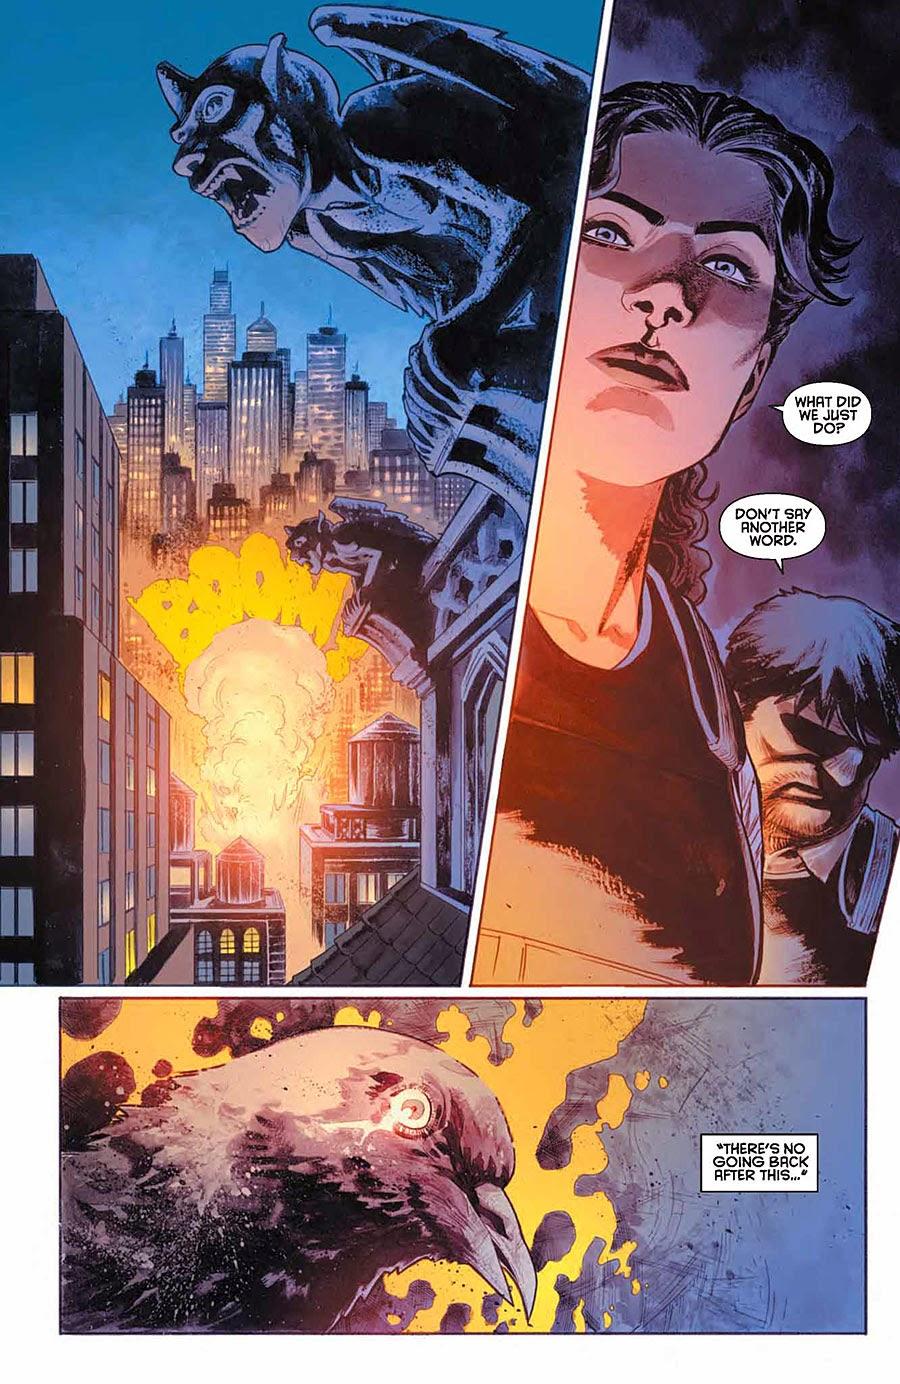 [Batman USA] - Notícias diversas do Morcego !!! - Página 2 DTC-950-dyluxlo-res-crop-Page-8-2048-55491536554a51-95365567-0007b